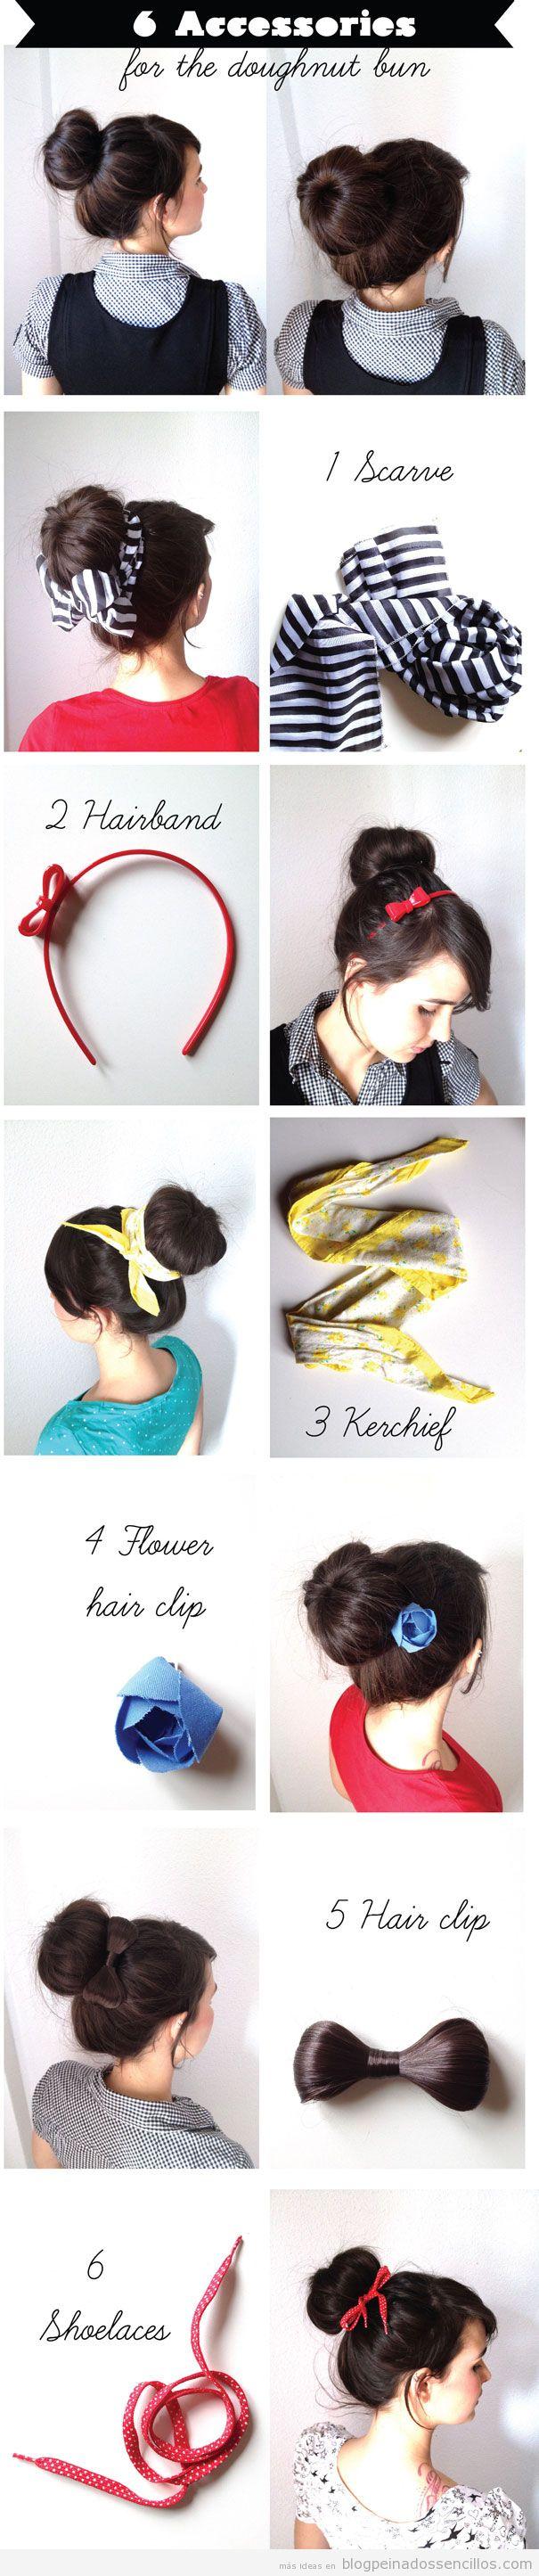 Ideas de accesorios de pelo para llevar con un moño donut